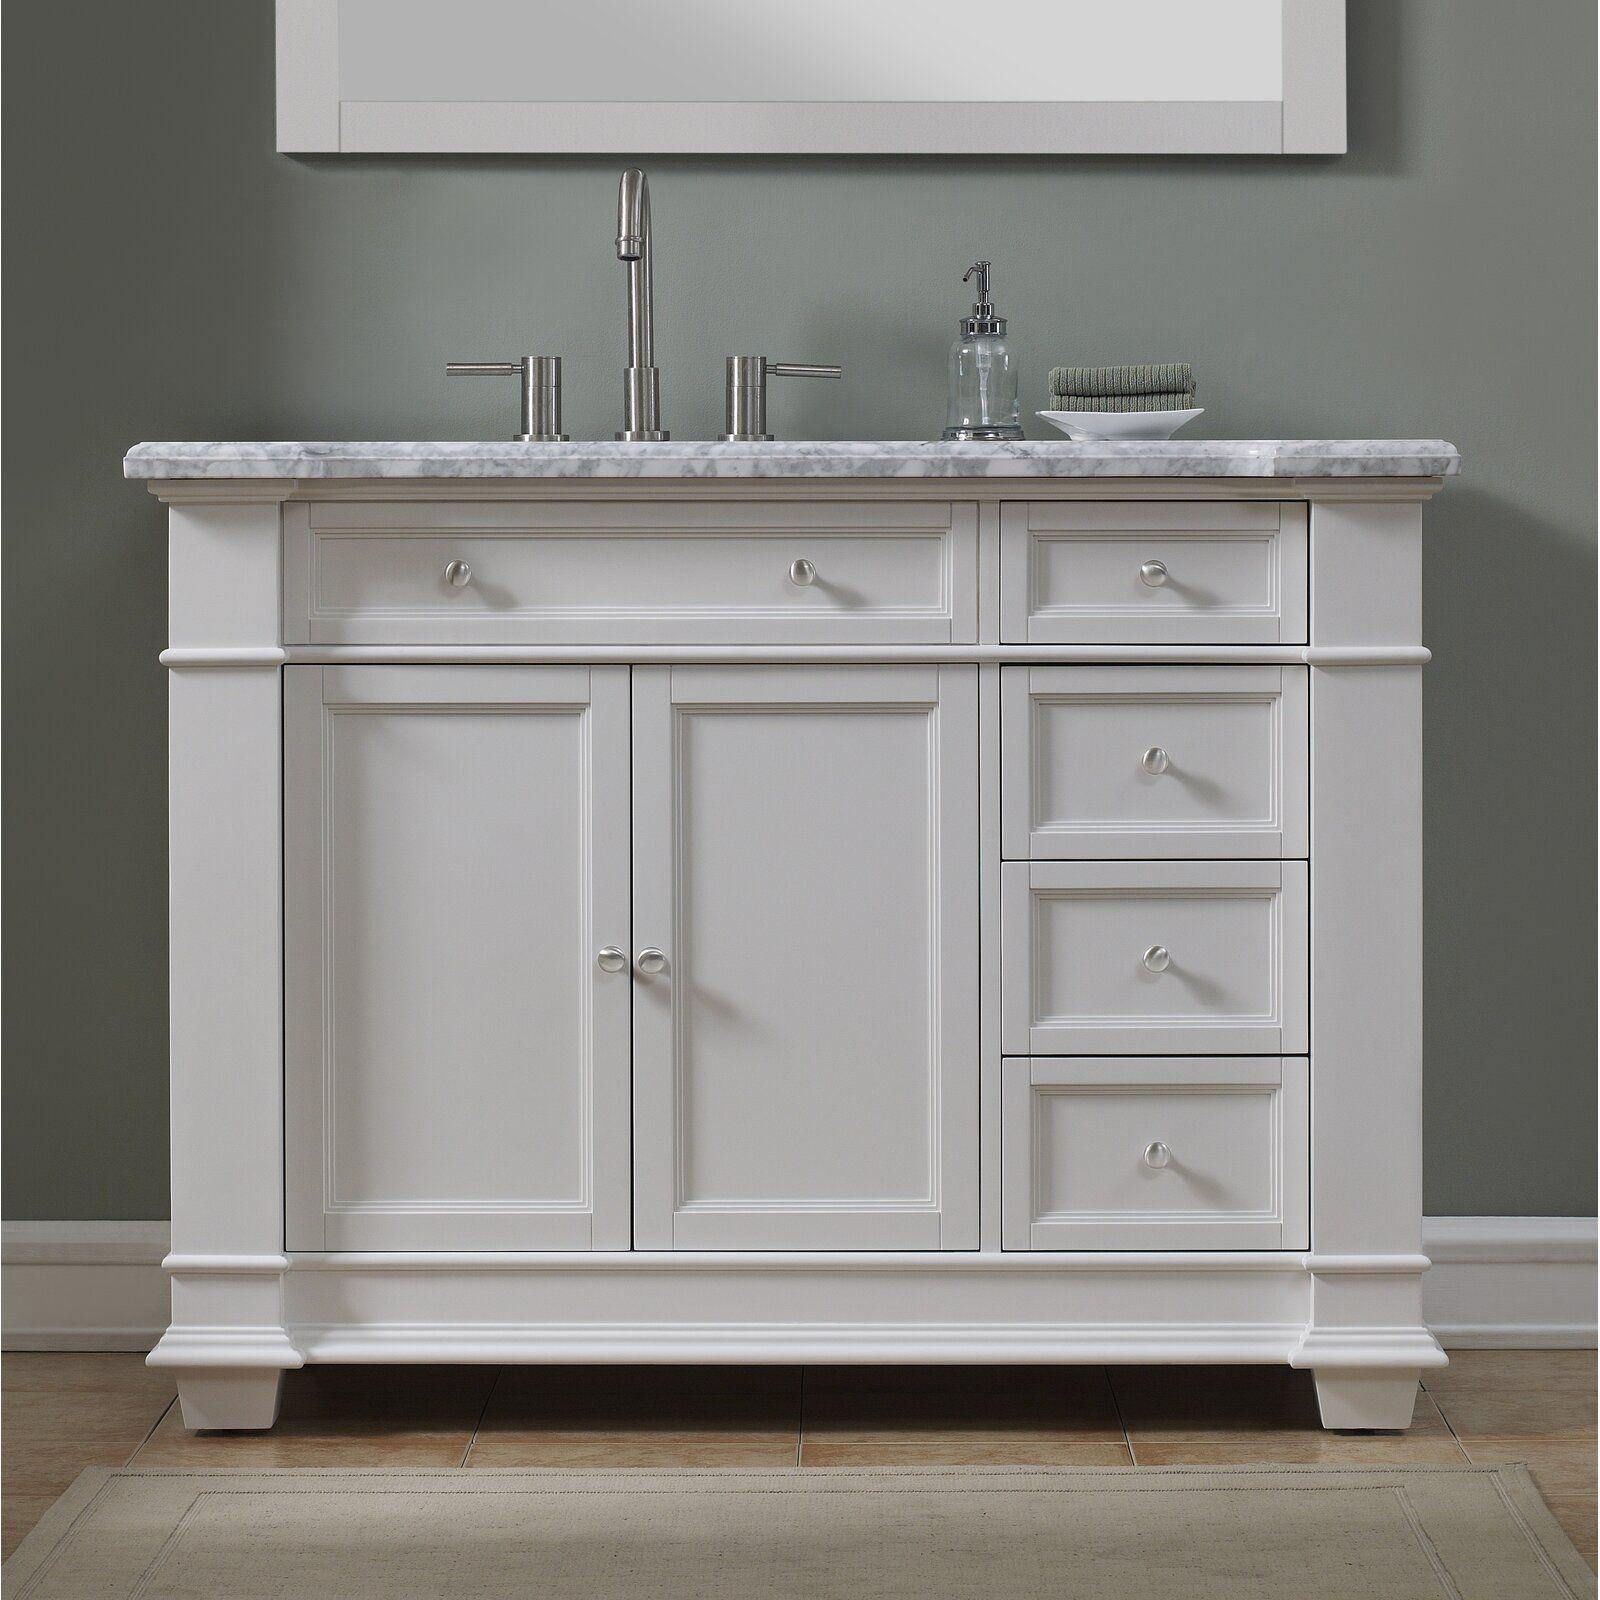 Riccardo 48 Single Bathroom Vanity Set Bathroom Vanity Double Vanity Bathroom Single Bathroom Vanity